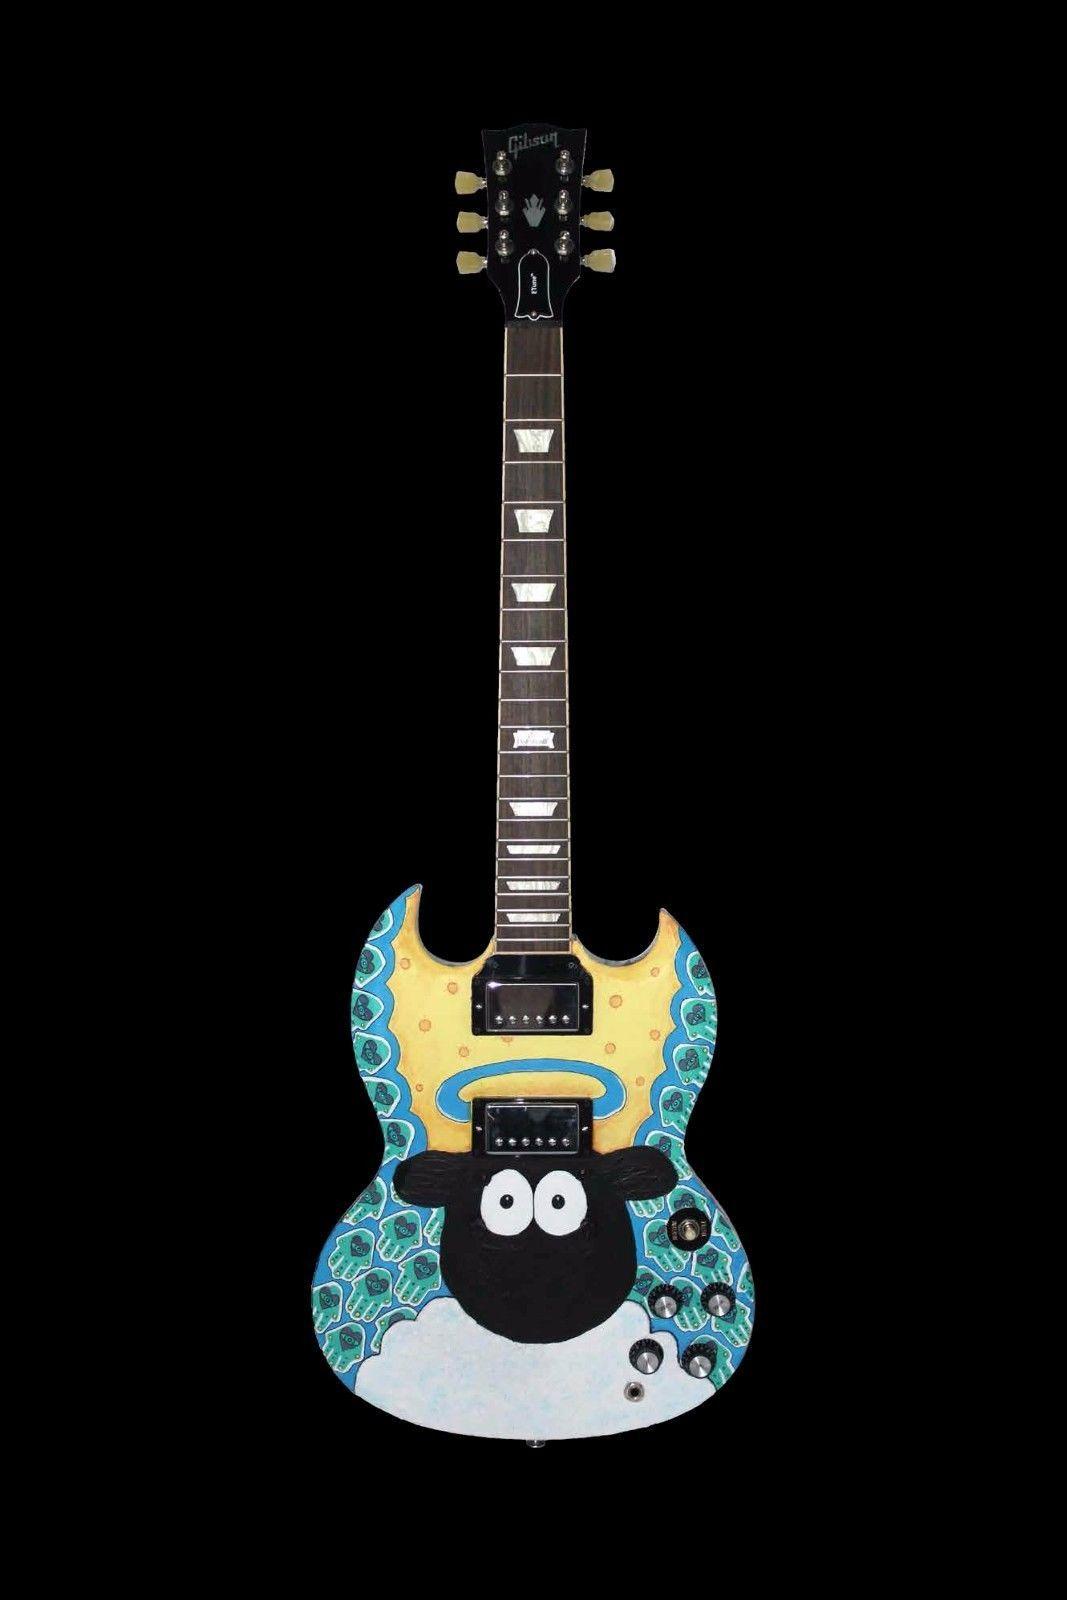 de956550369 Gibson SG Electric Guitar with Etune, custom paint job & hard case Unused